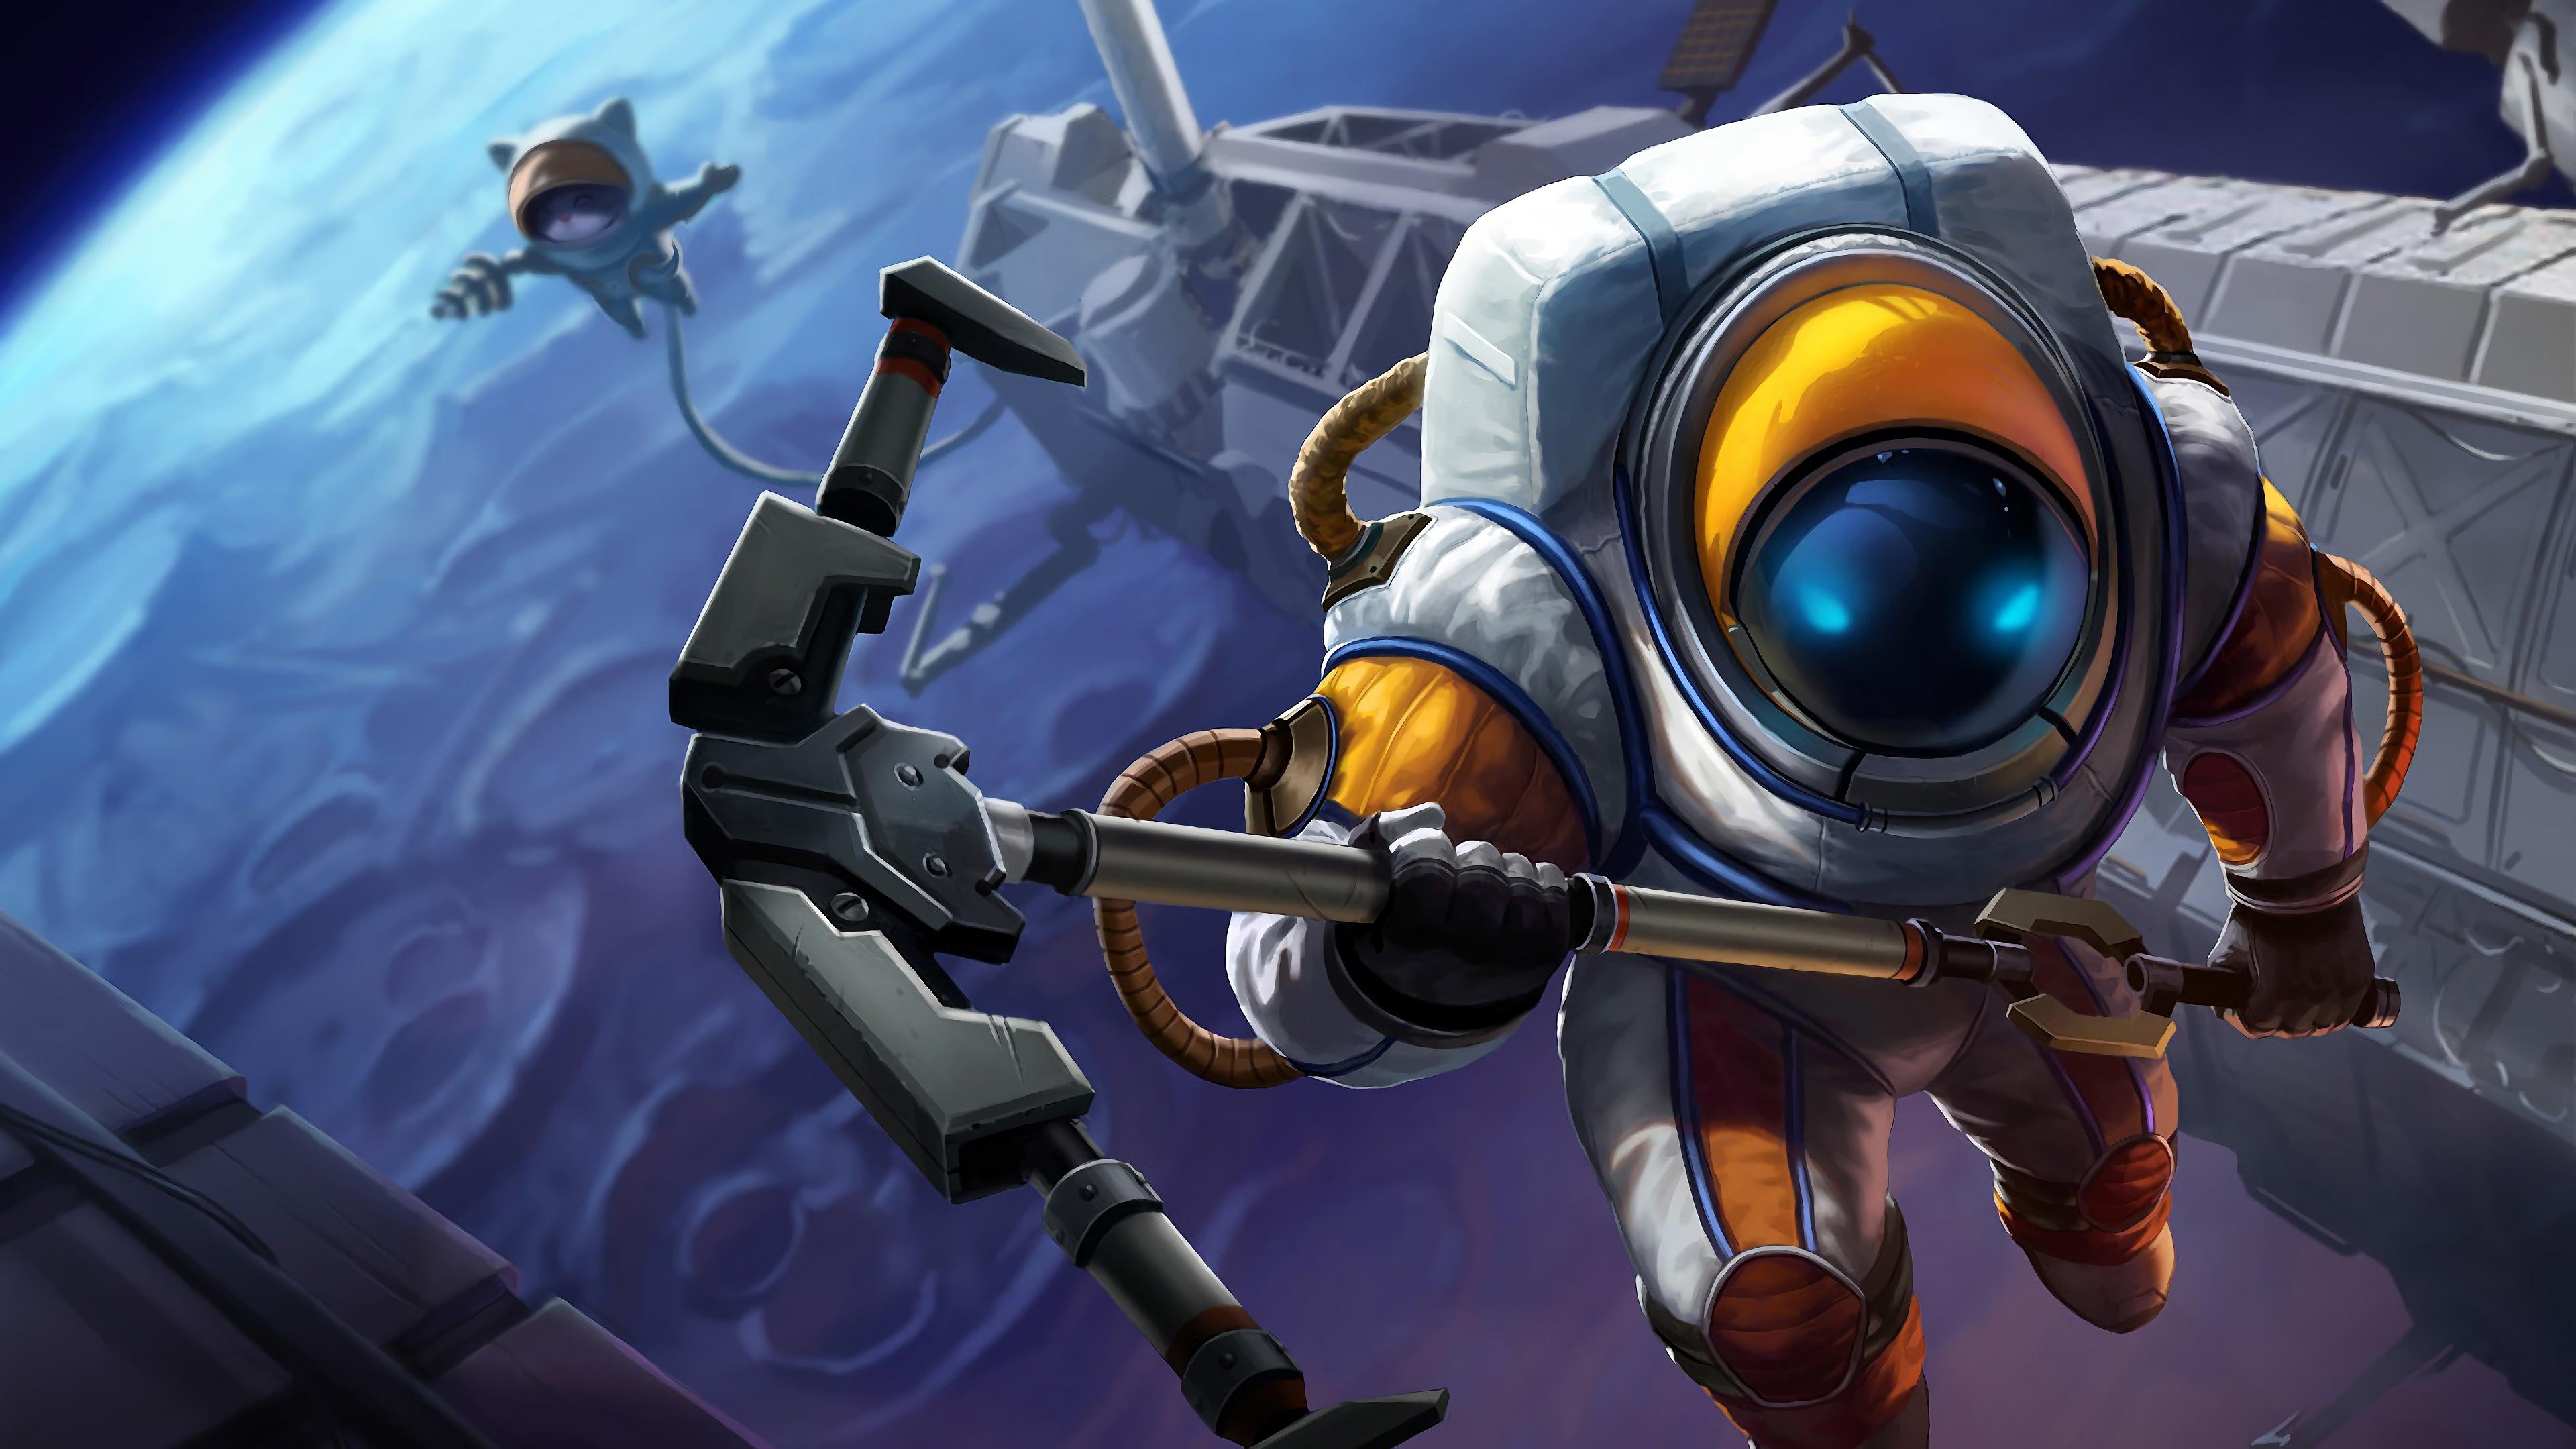 astronaut nautilus lol splash art league of legends 1574100358 - Astronaut Nautilus LoL Splash Art League of Legends - Nautilus, league of legends